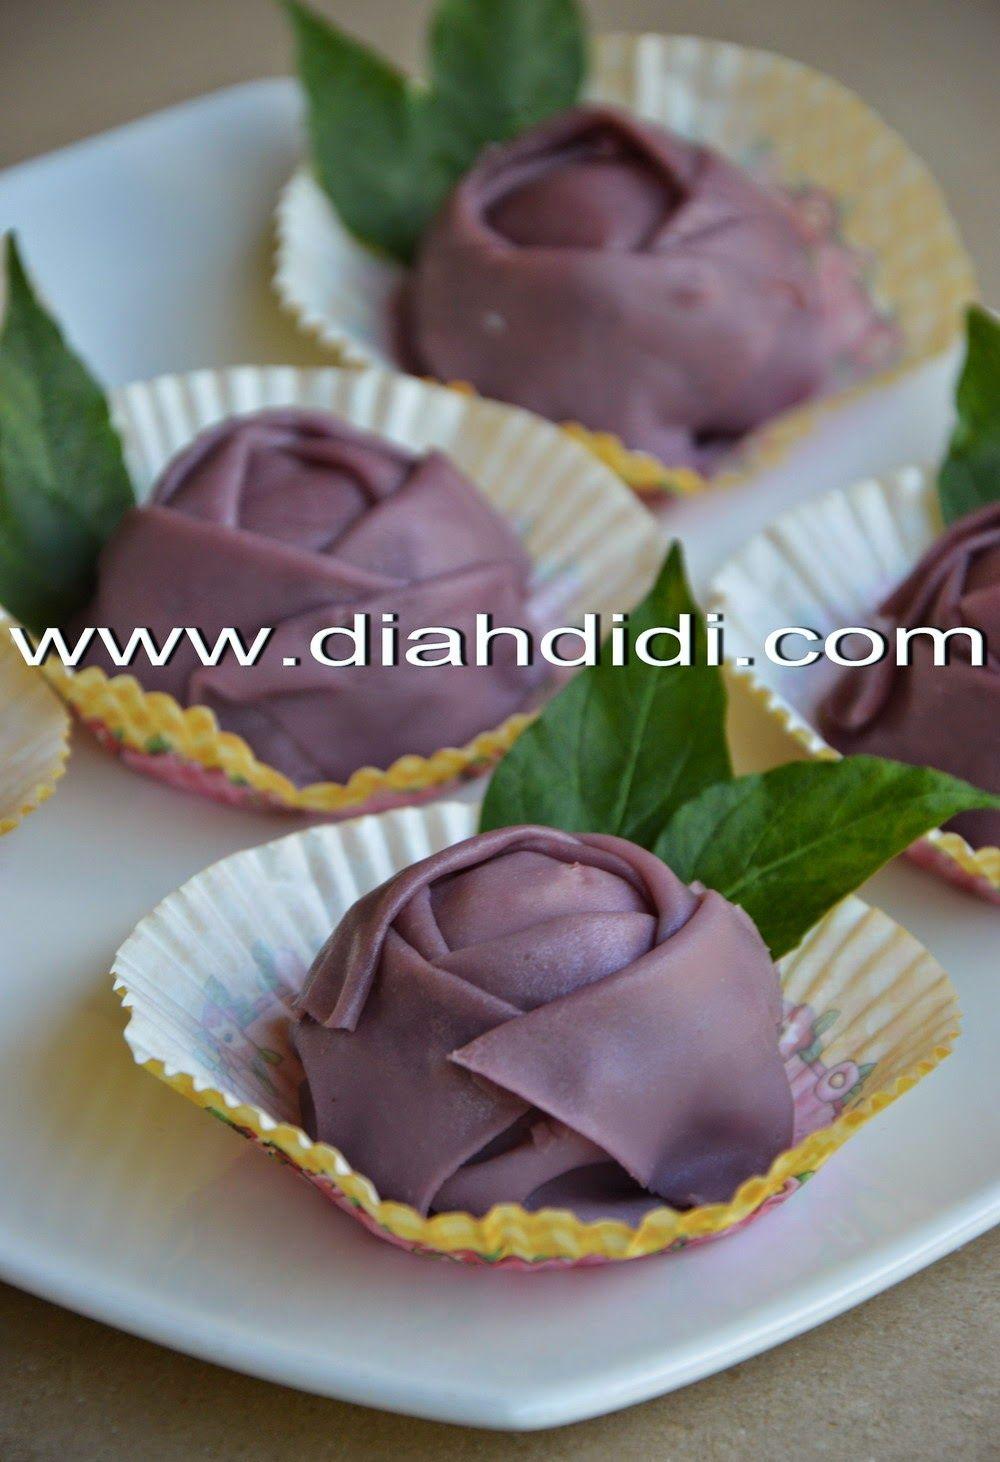 Diah Didi S Kitchen Dadar Gulung Mawar Ubi Ungu Makanan Kue Lezat Makanan Enak